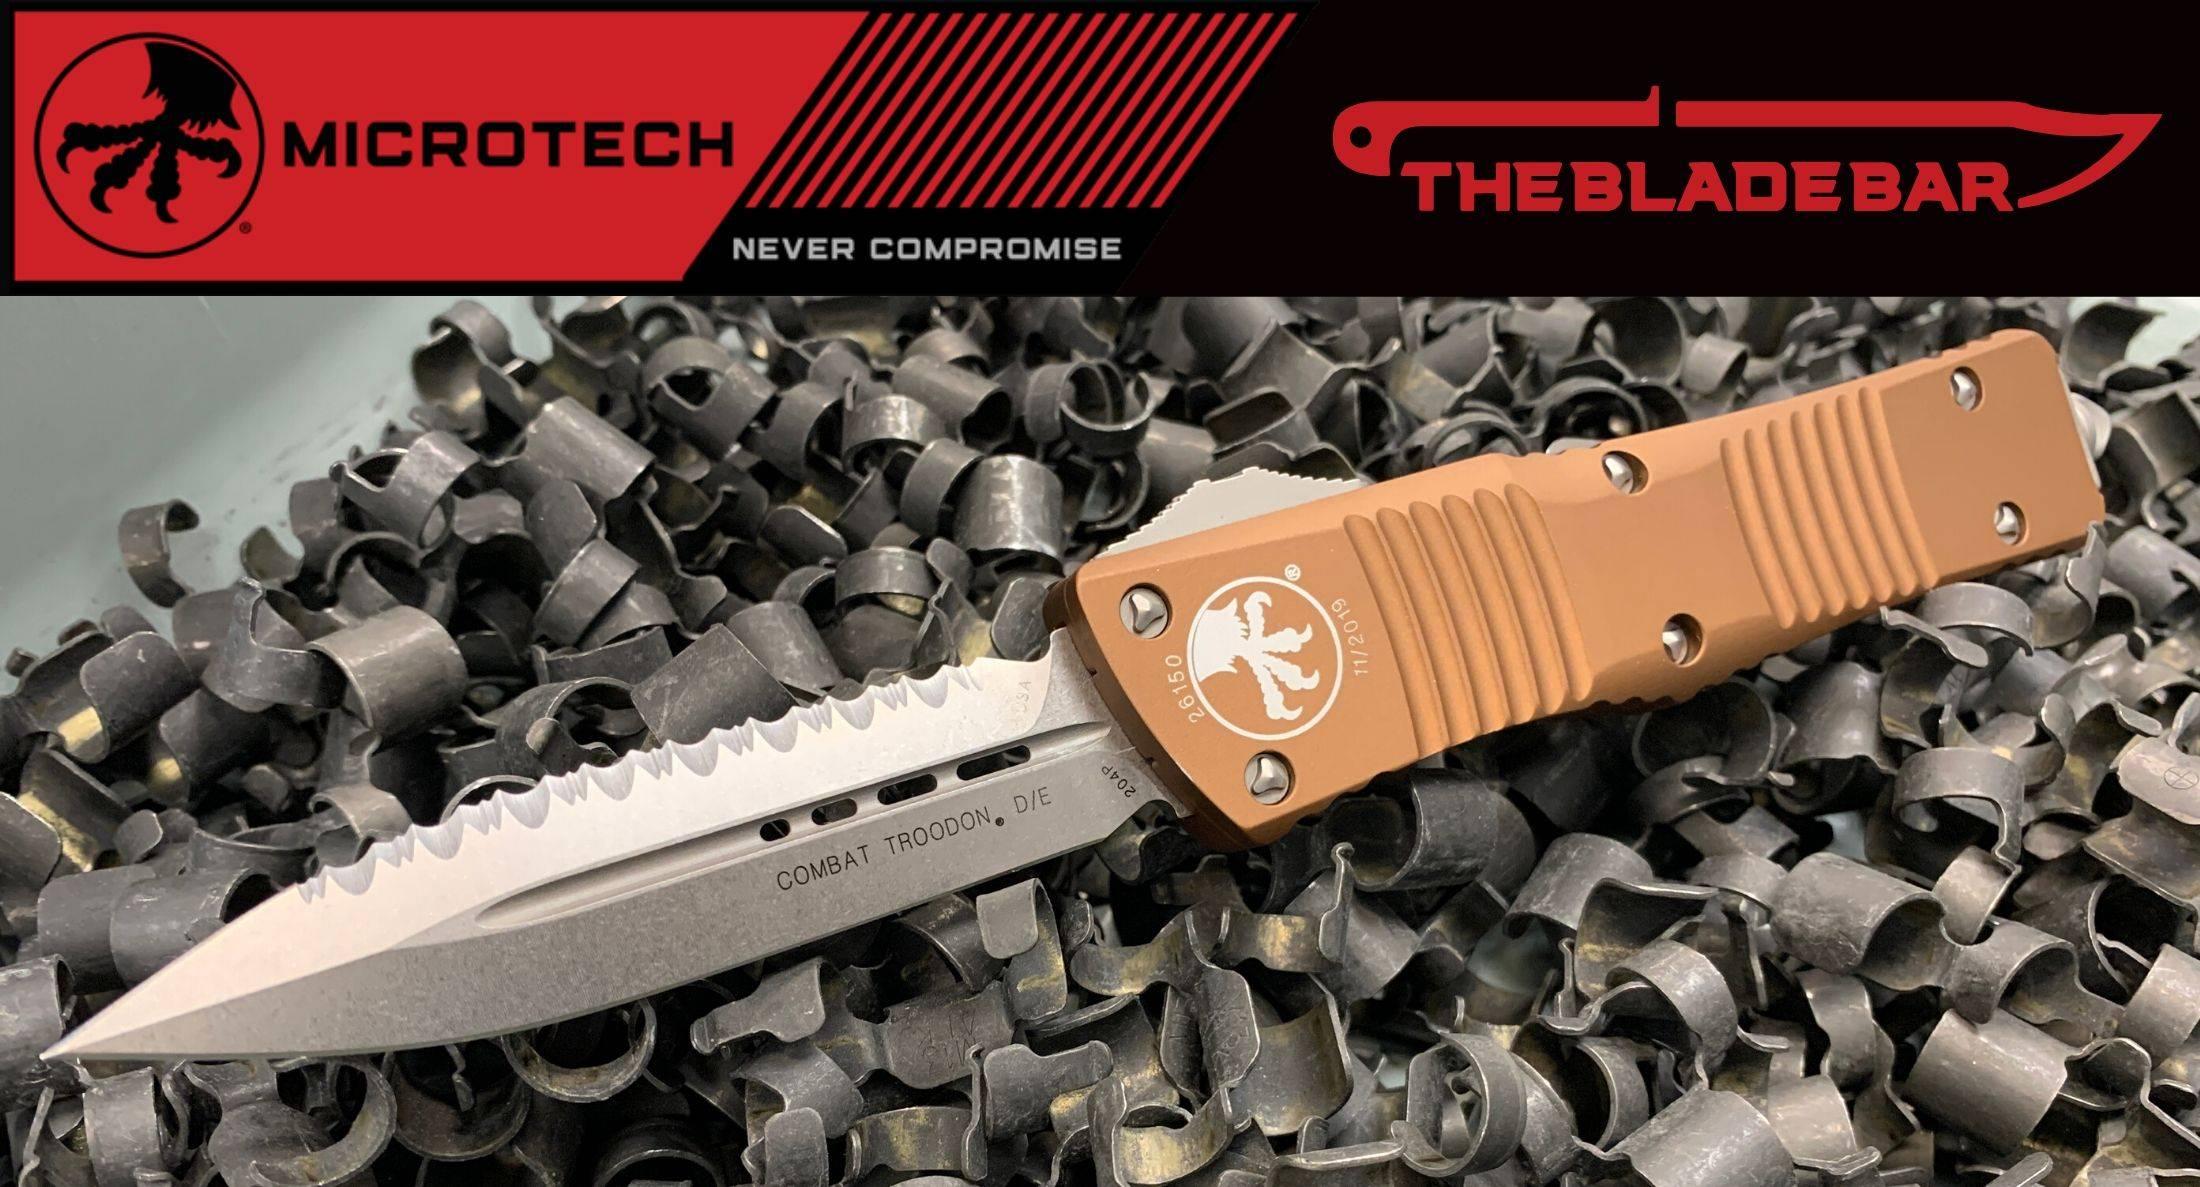 microtech knife dallas